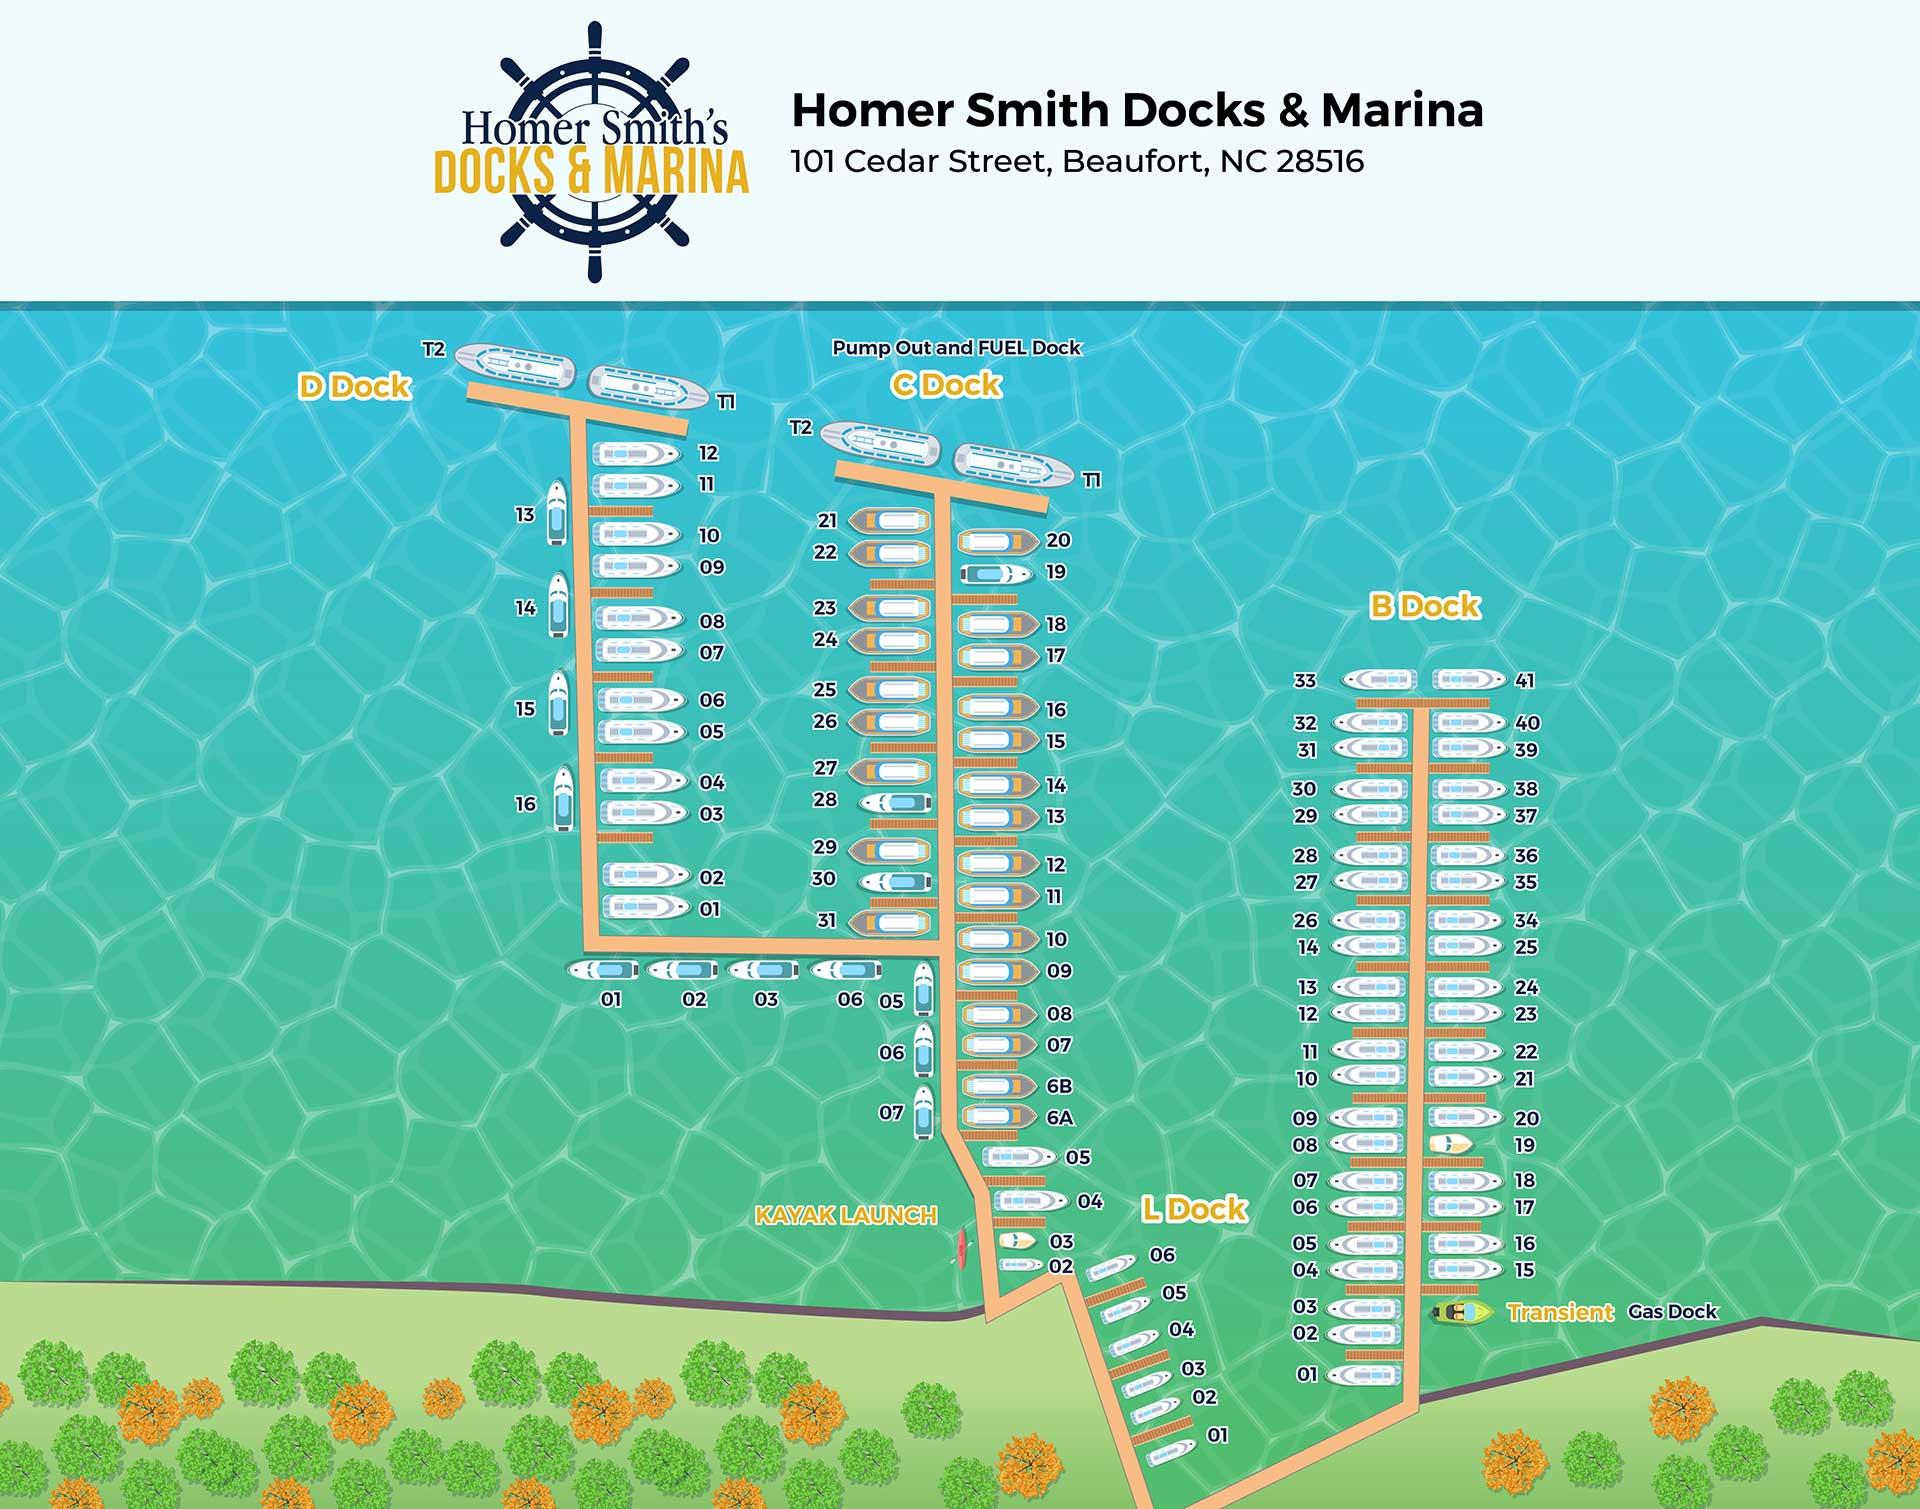 Homer Smith Docks